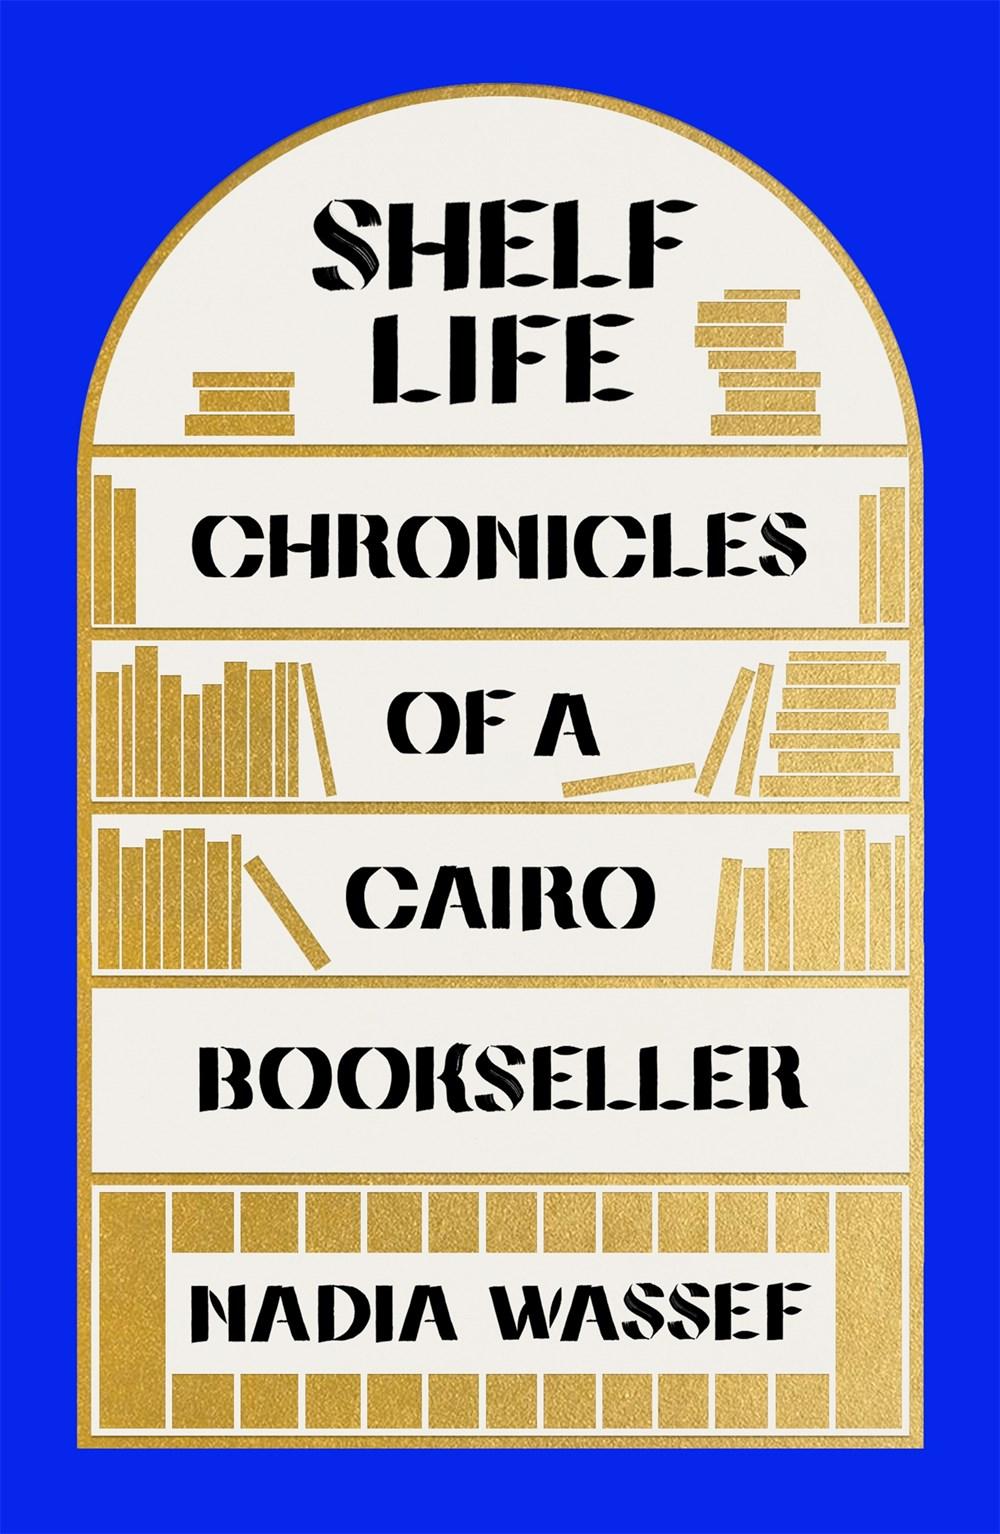 Shelf Life by Nadia Wassef